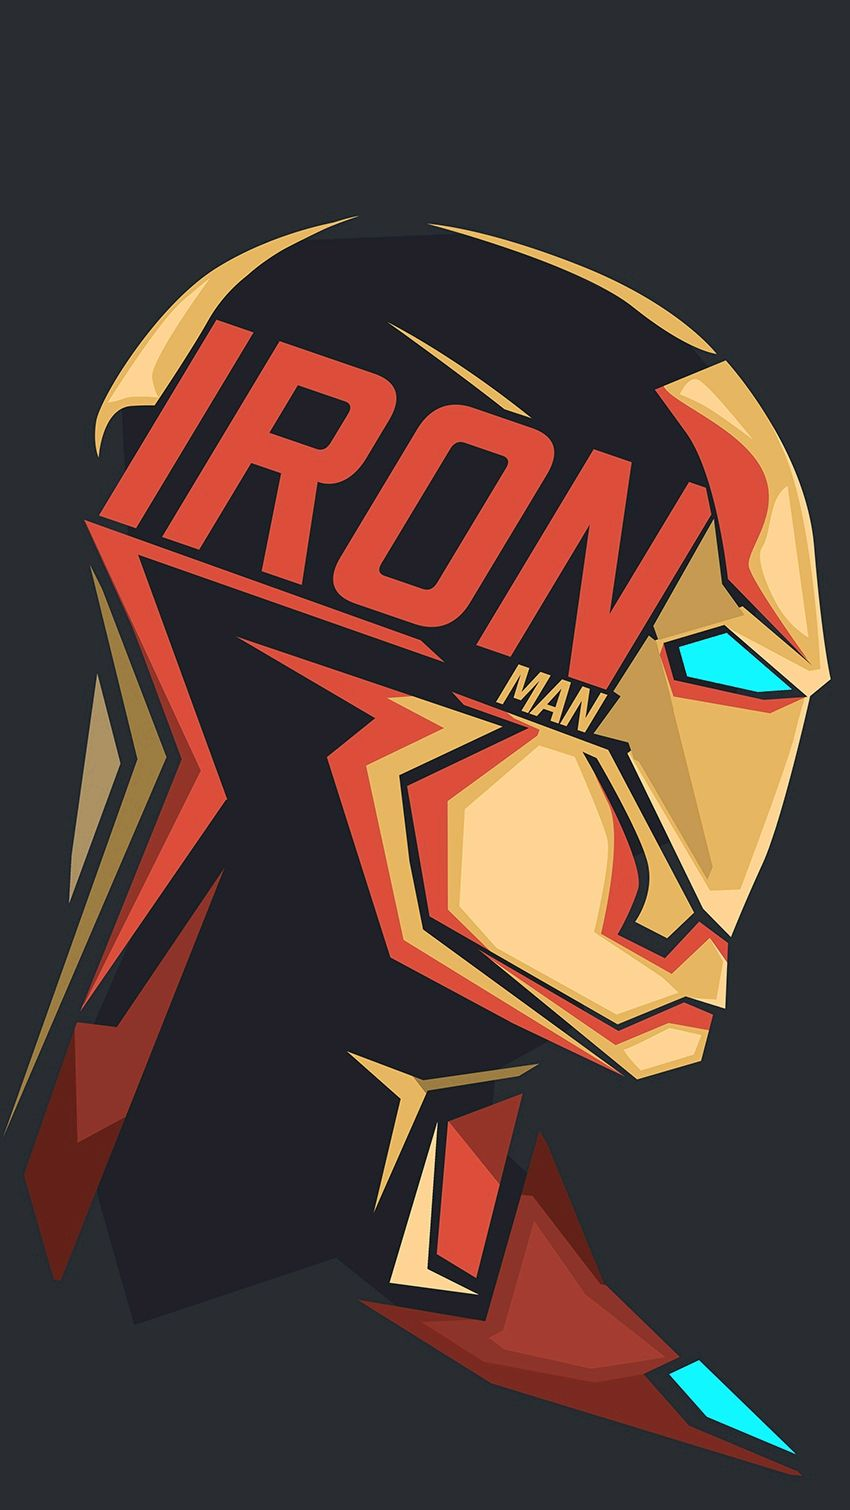 Iron Man Text Art iPhone Wallpaper iphoneswallpapers com